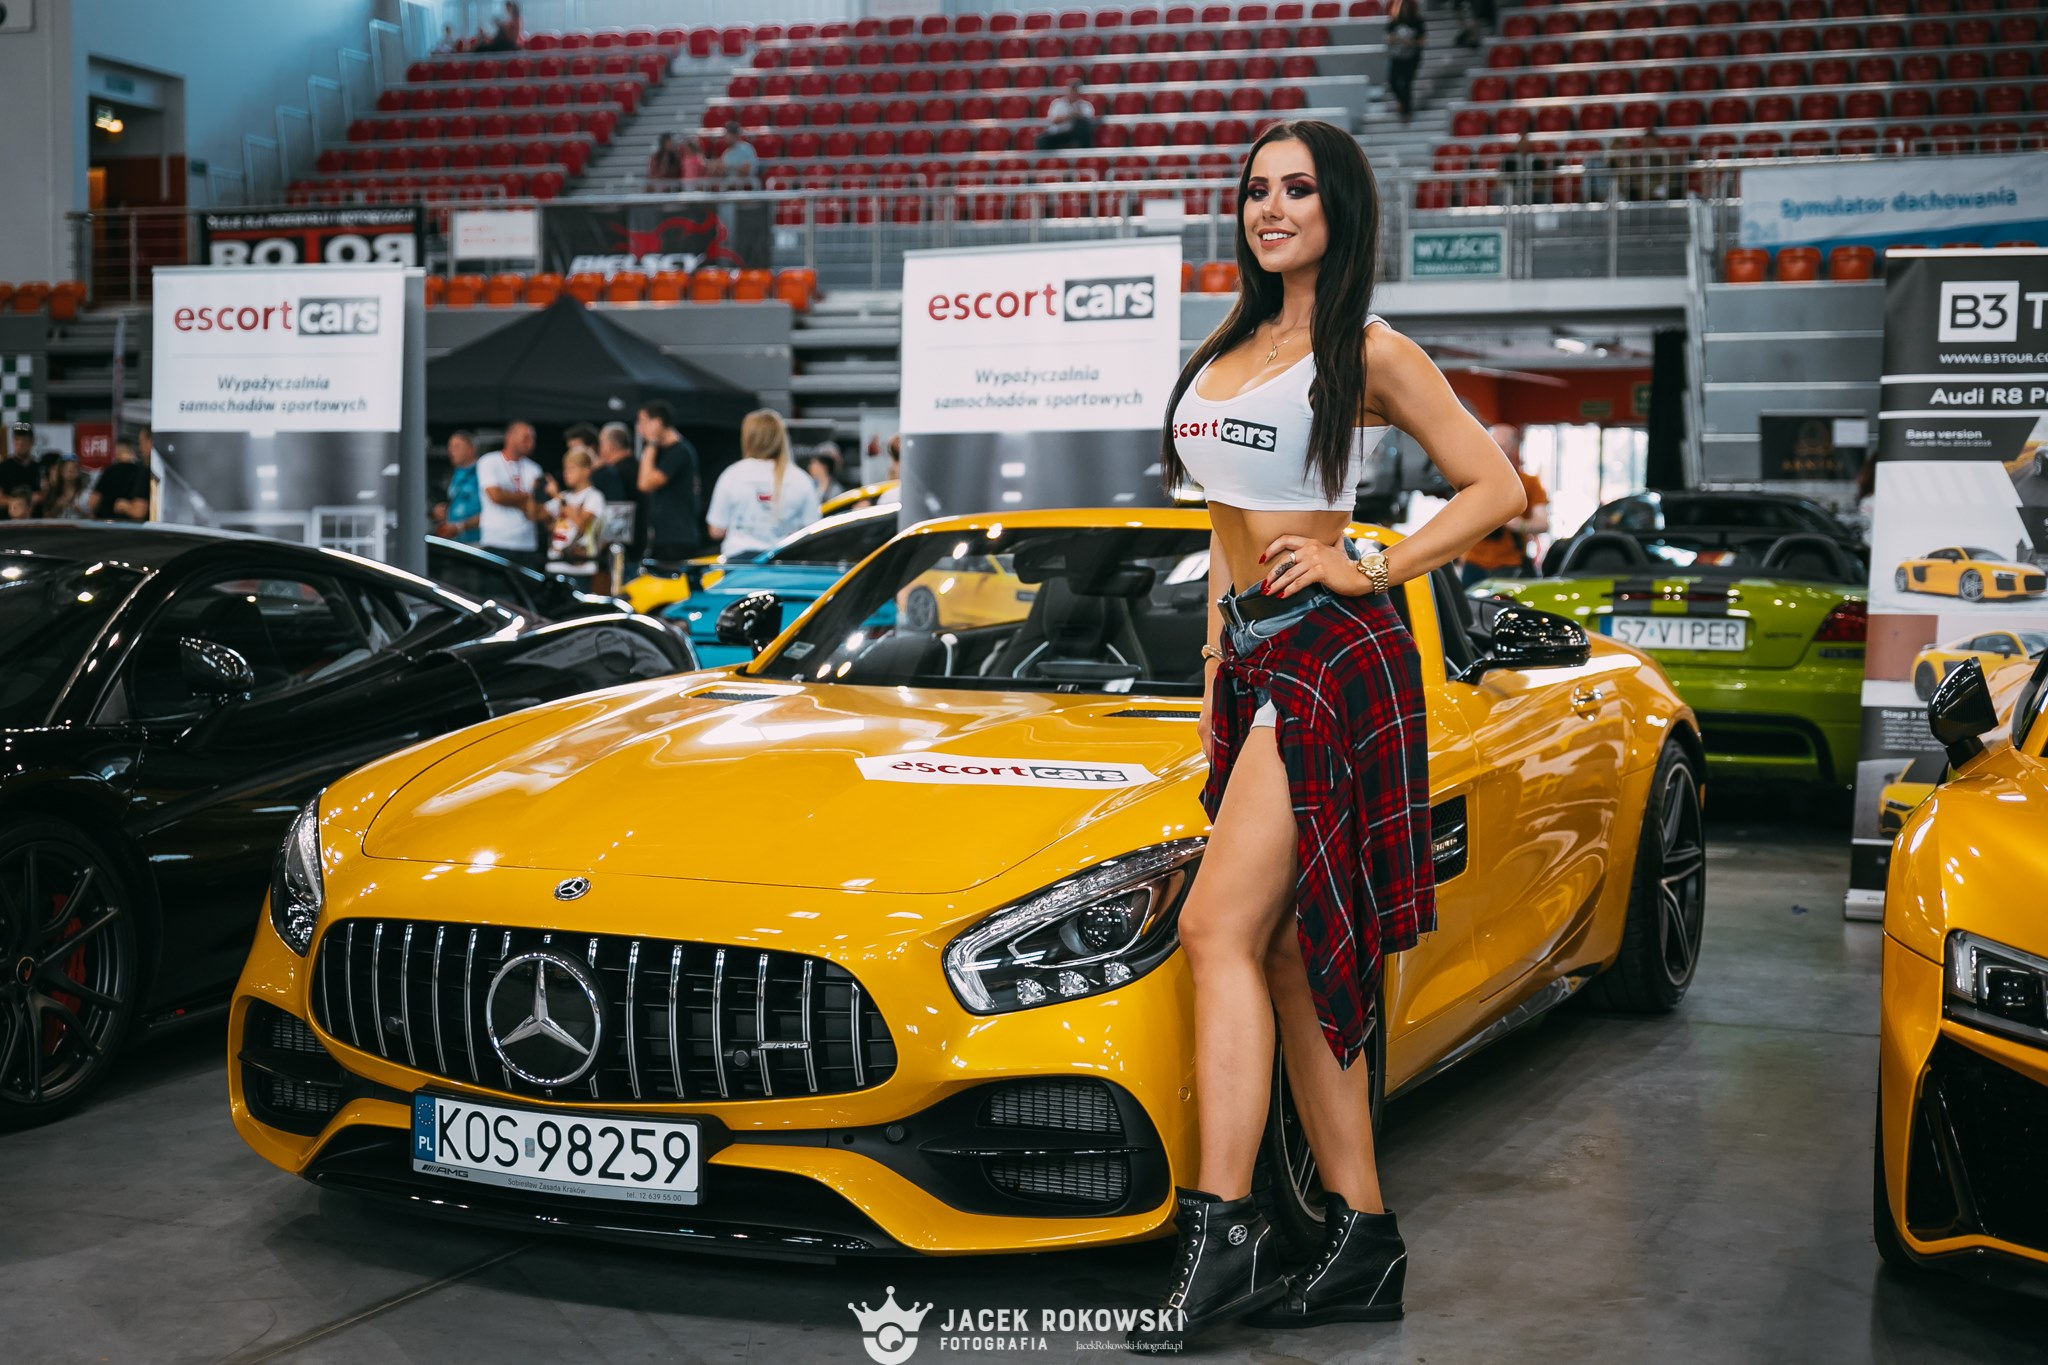 Escort Cars Motoshow Bielsko-Biała 2019